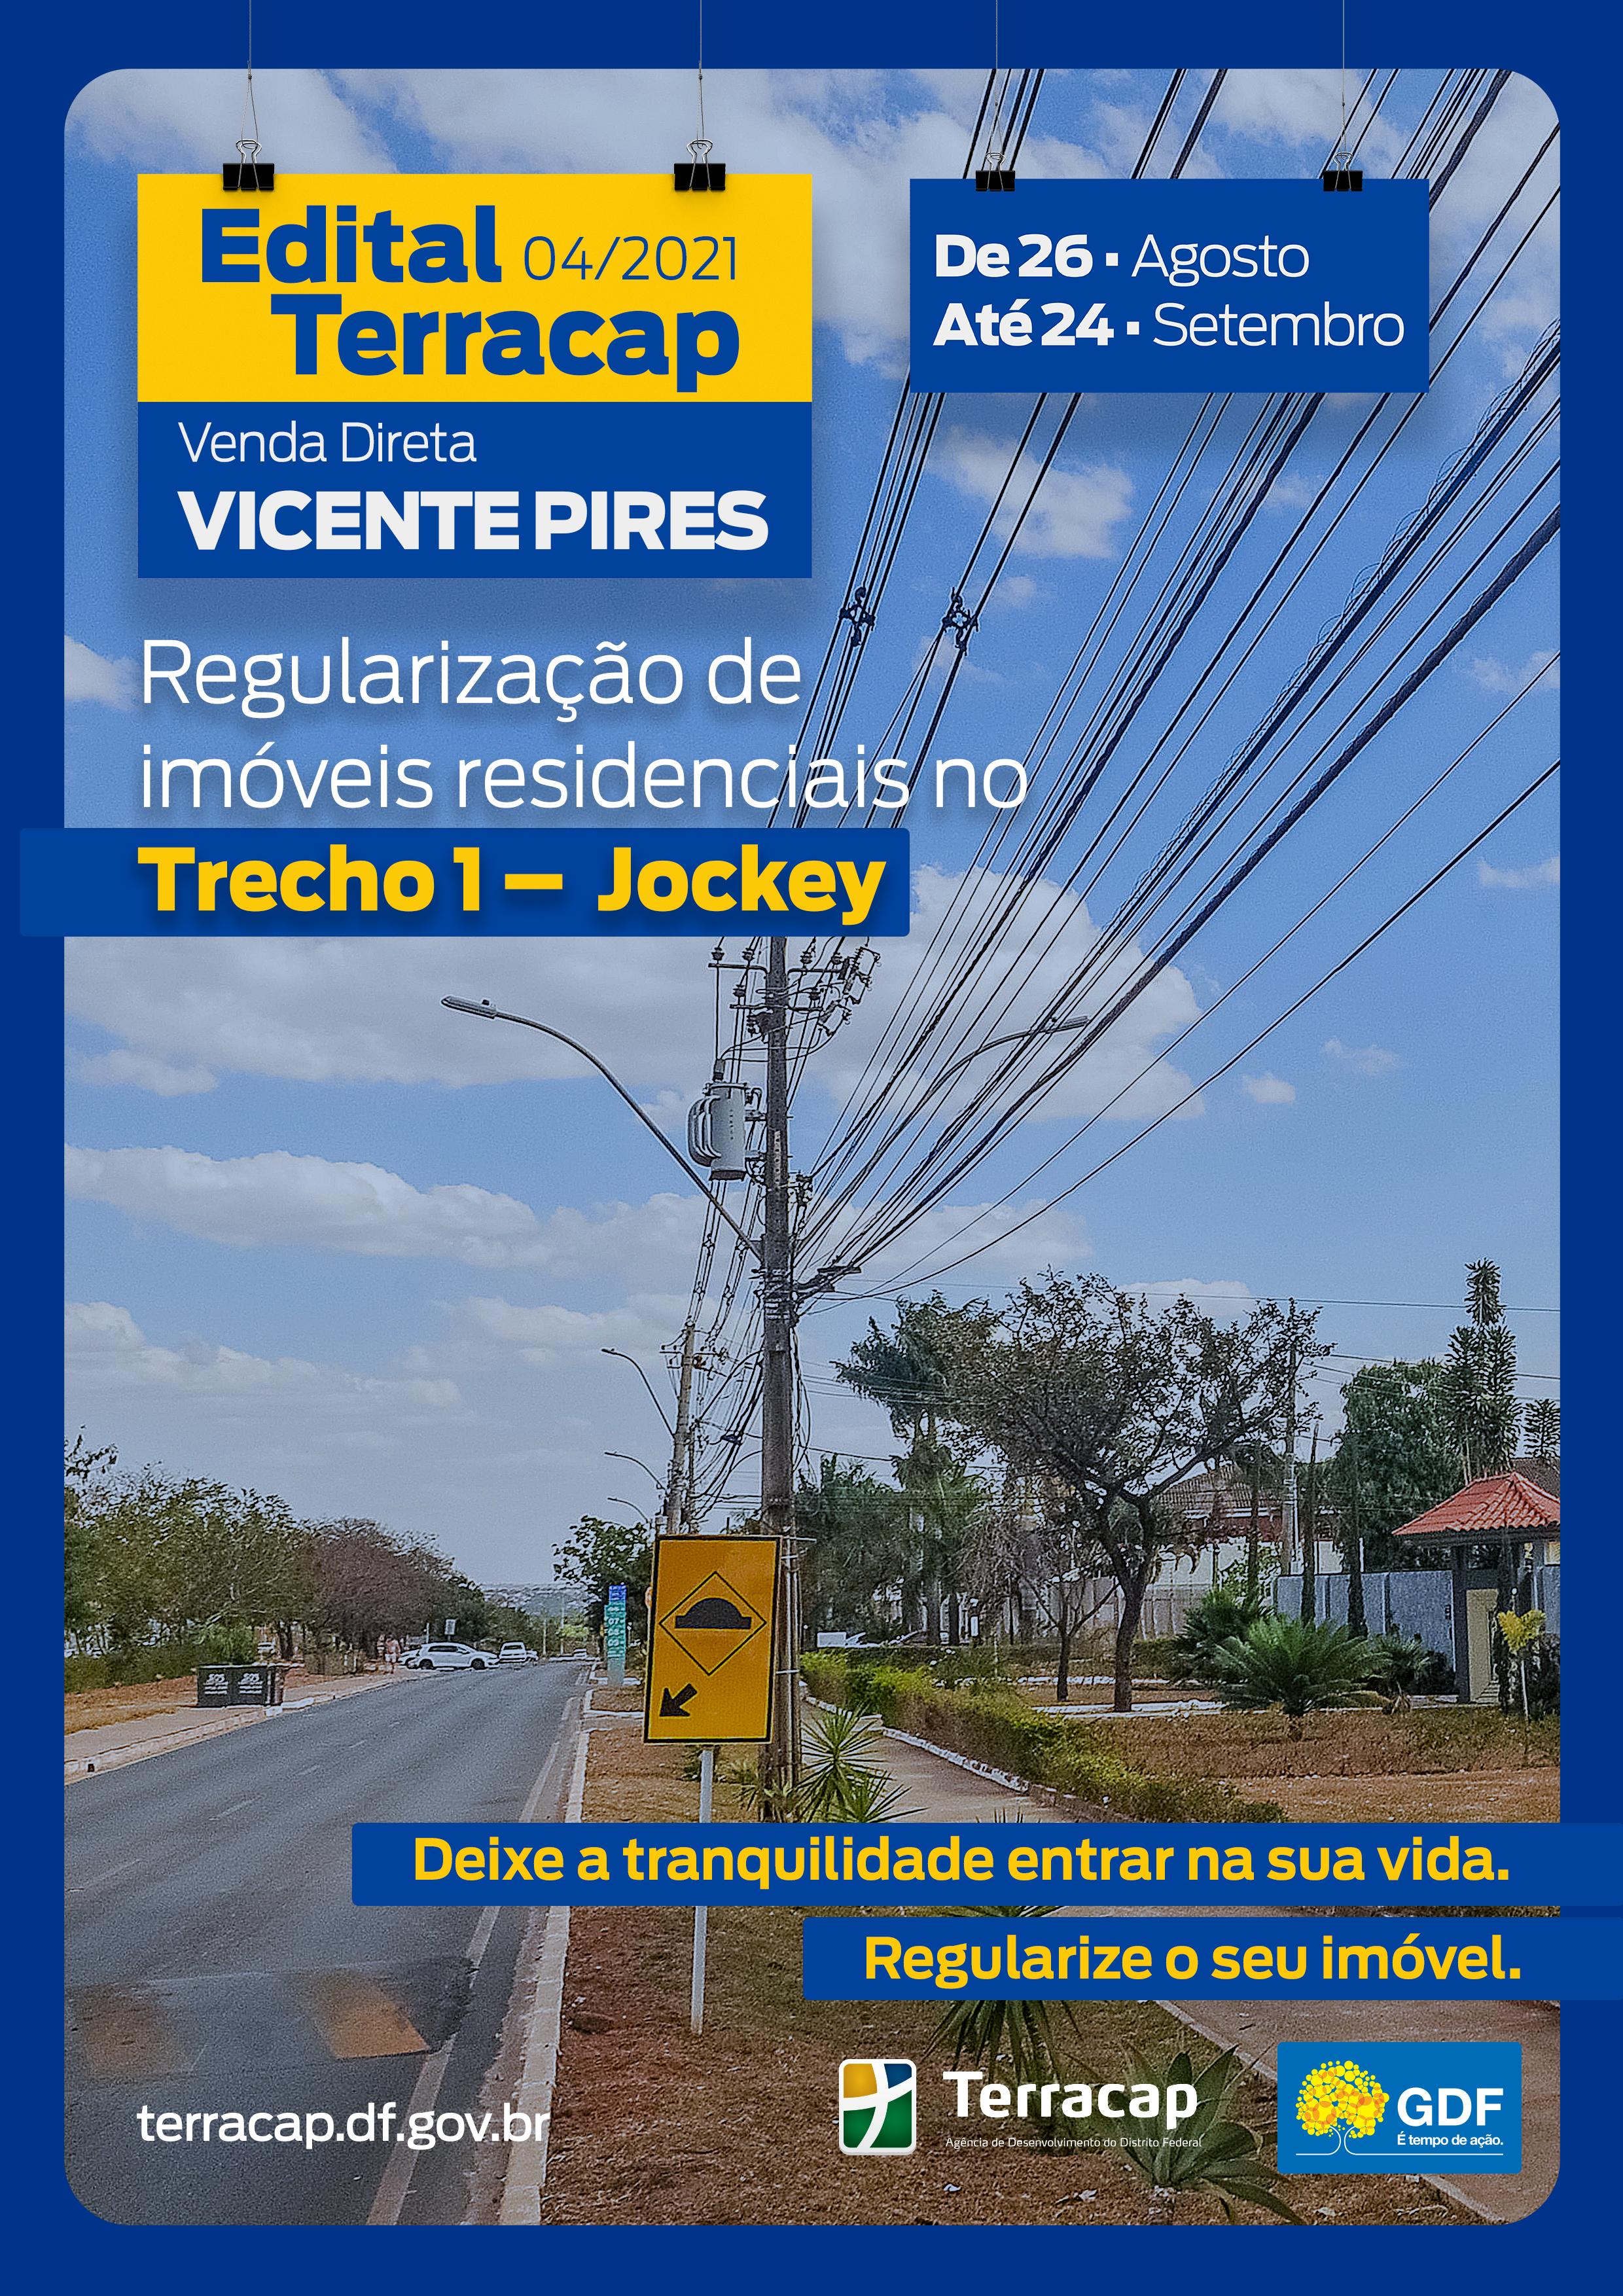 Edital 04/2021 - Venda Direta Vicente Pires Trecho 1